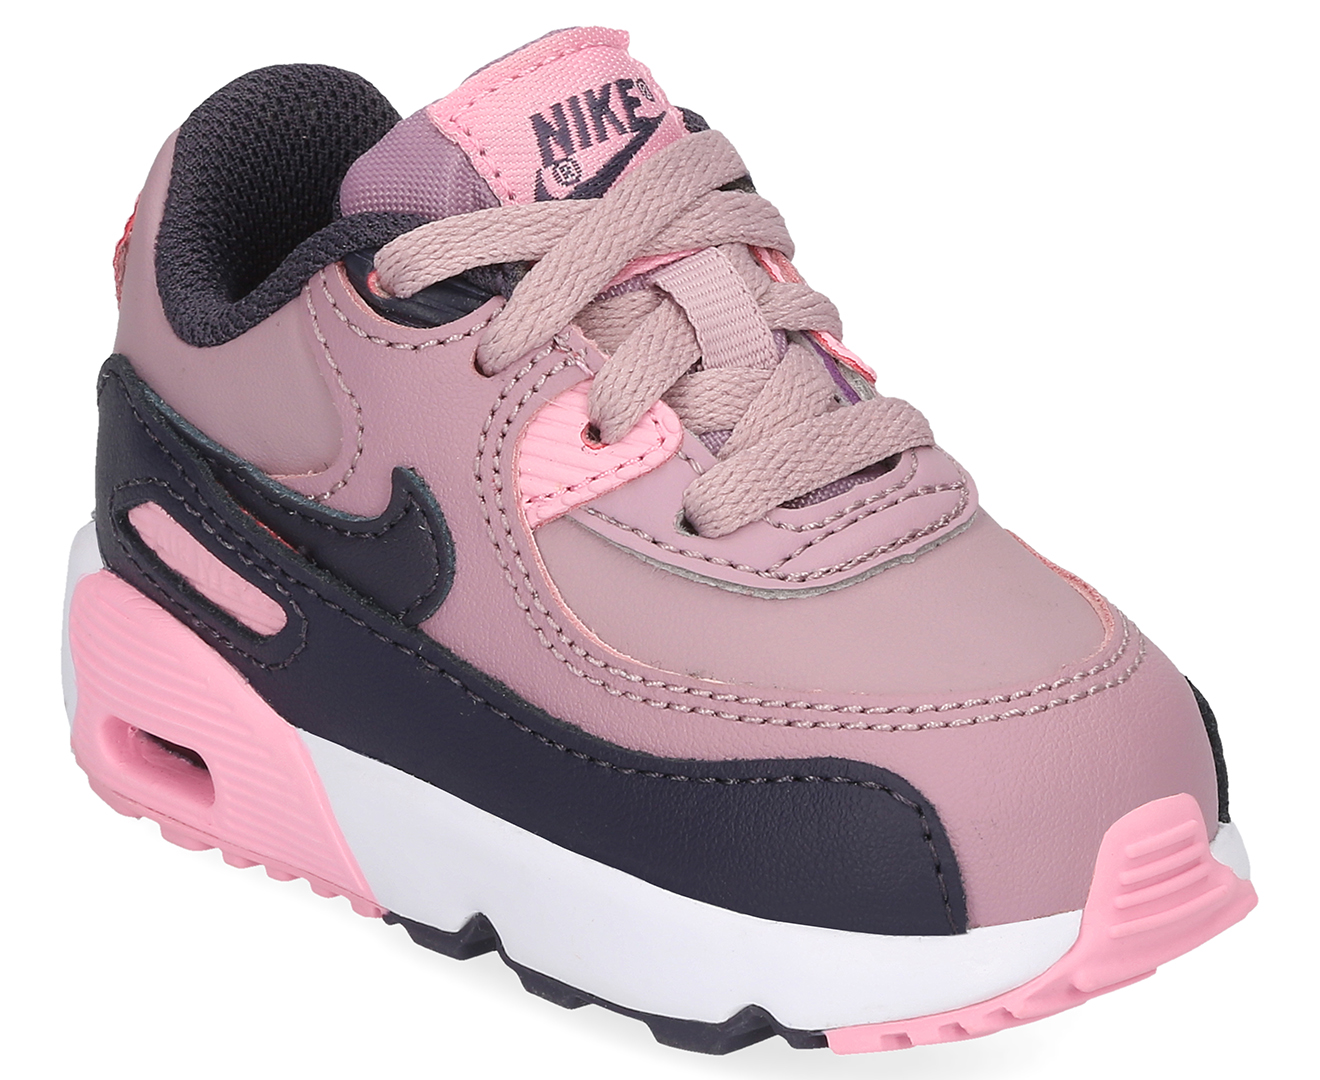 save off 7e6f6 ba314 Nike Toddler Girls  Air Max 90 LTR Shoe - Elemental Rose Gridiron-Pink    Mumgo.com.au